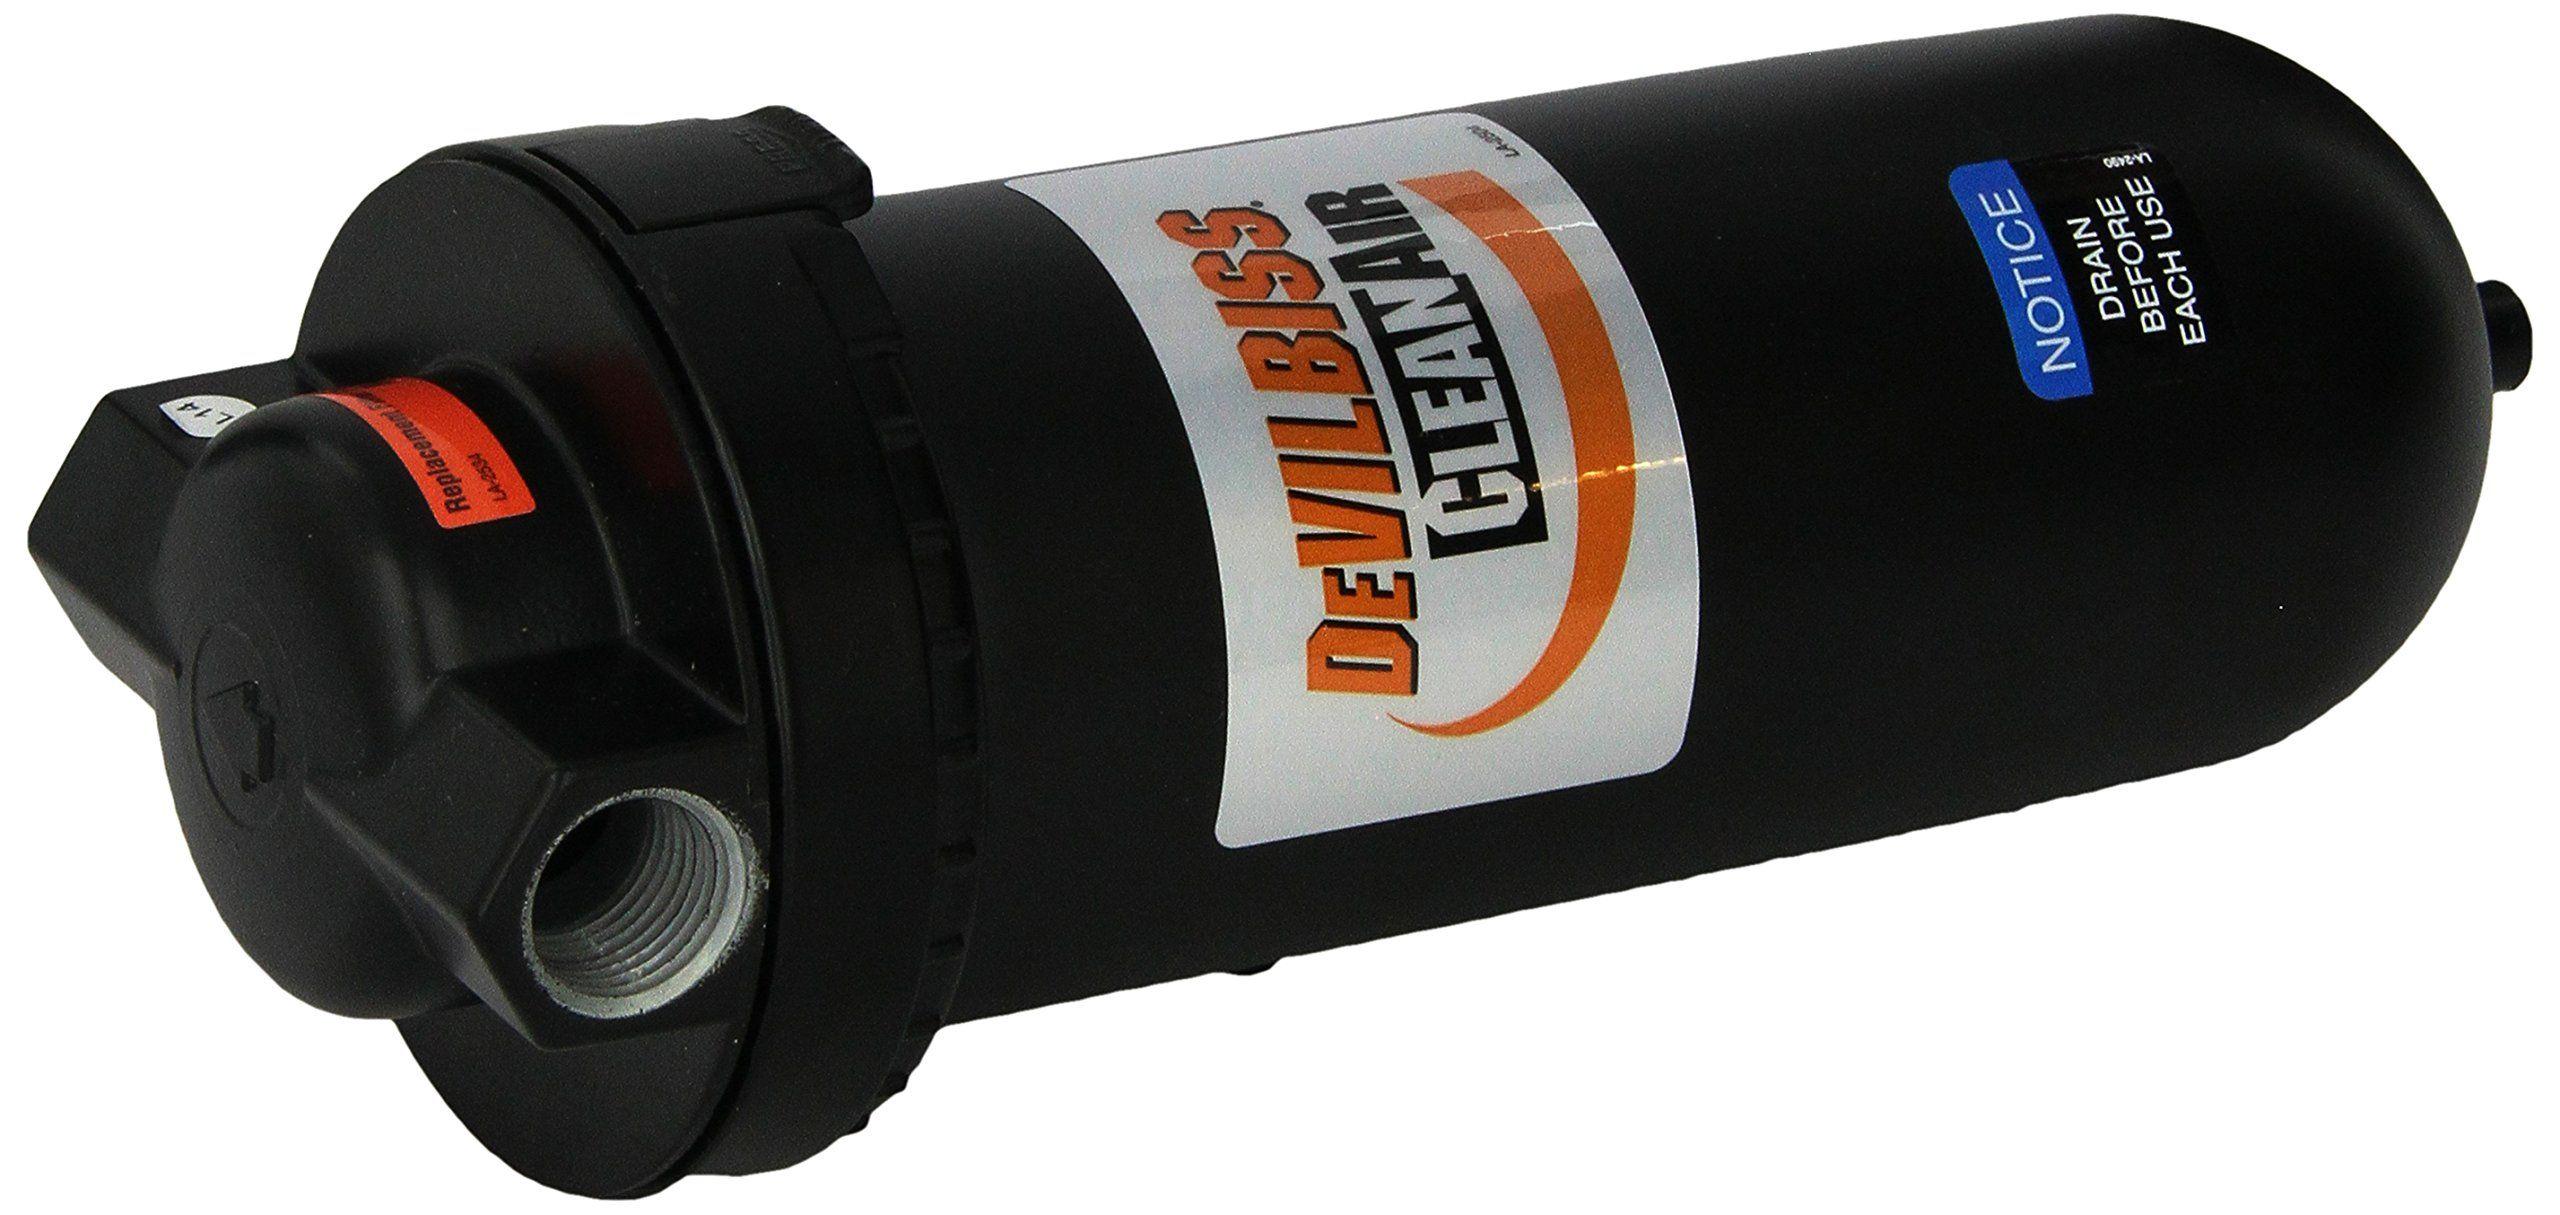 DeVilbiss 130041 100 CFM Air Line Filter You can find